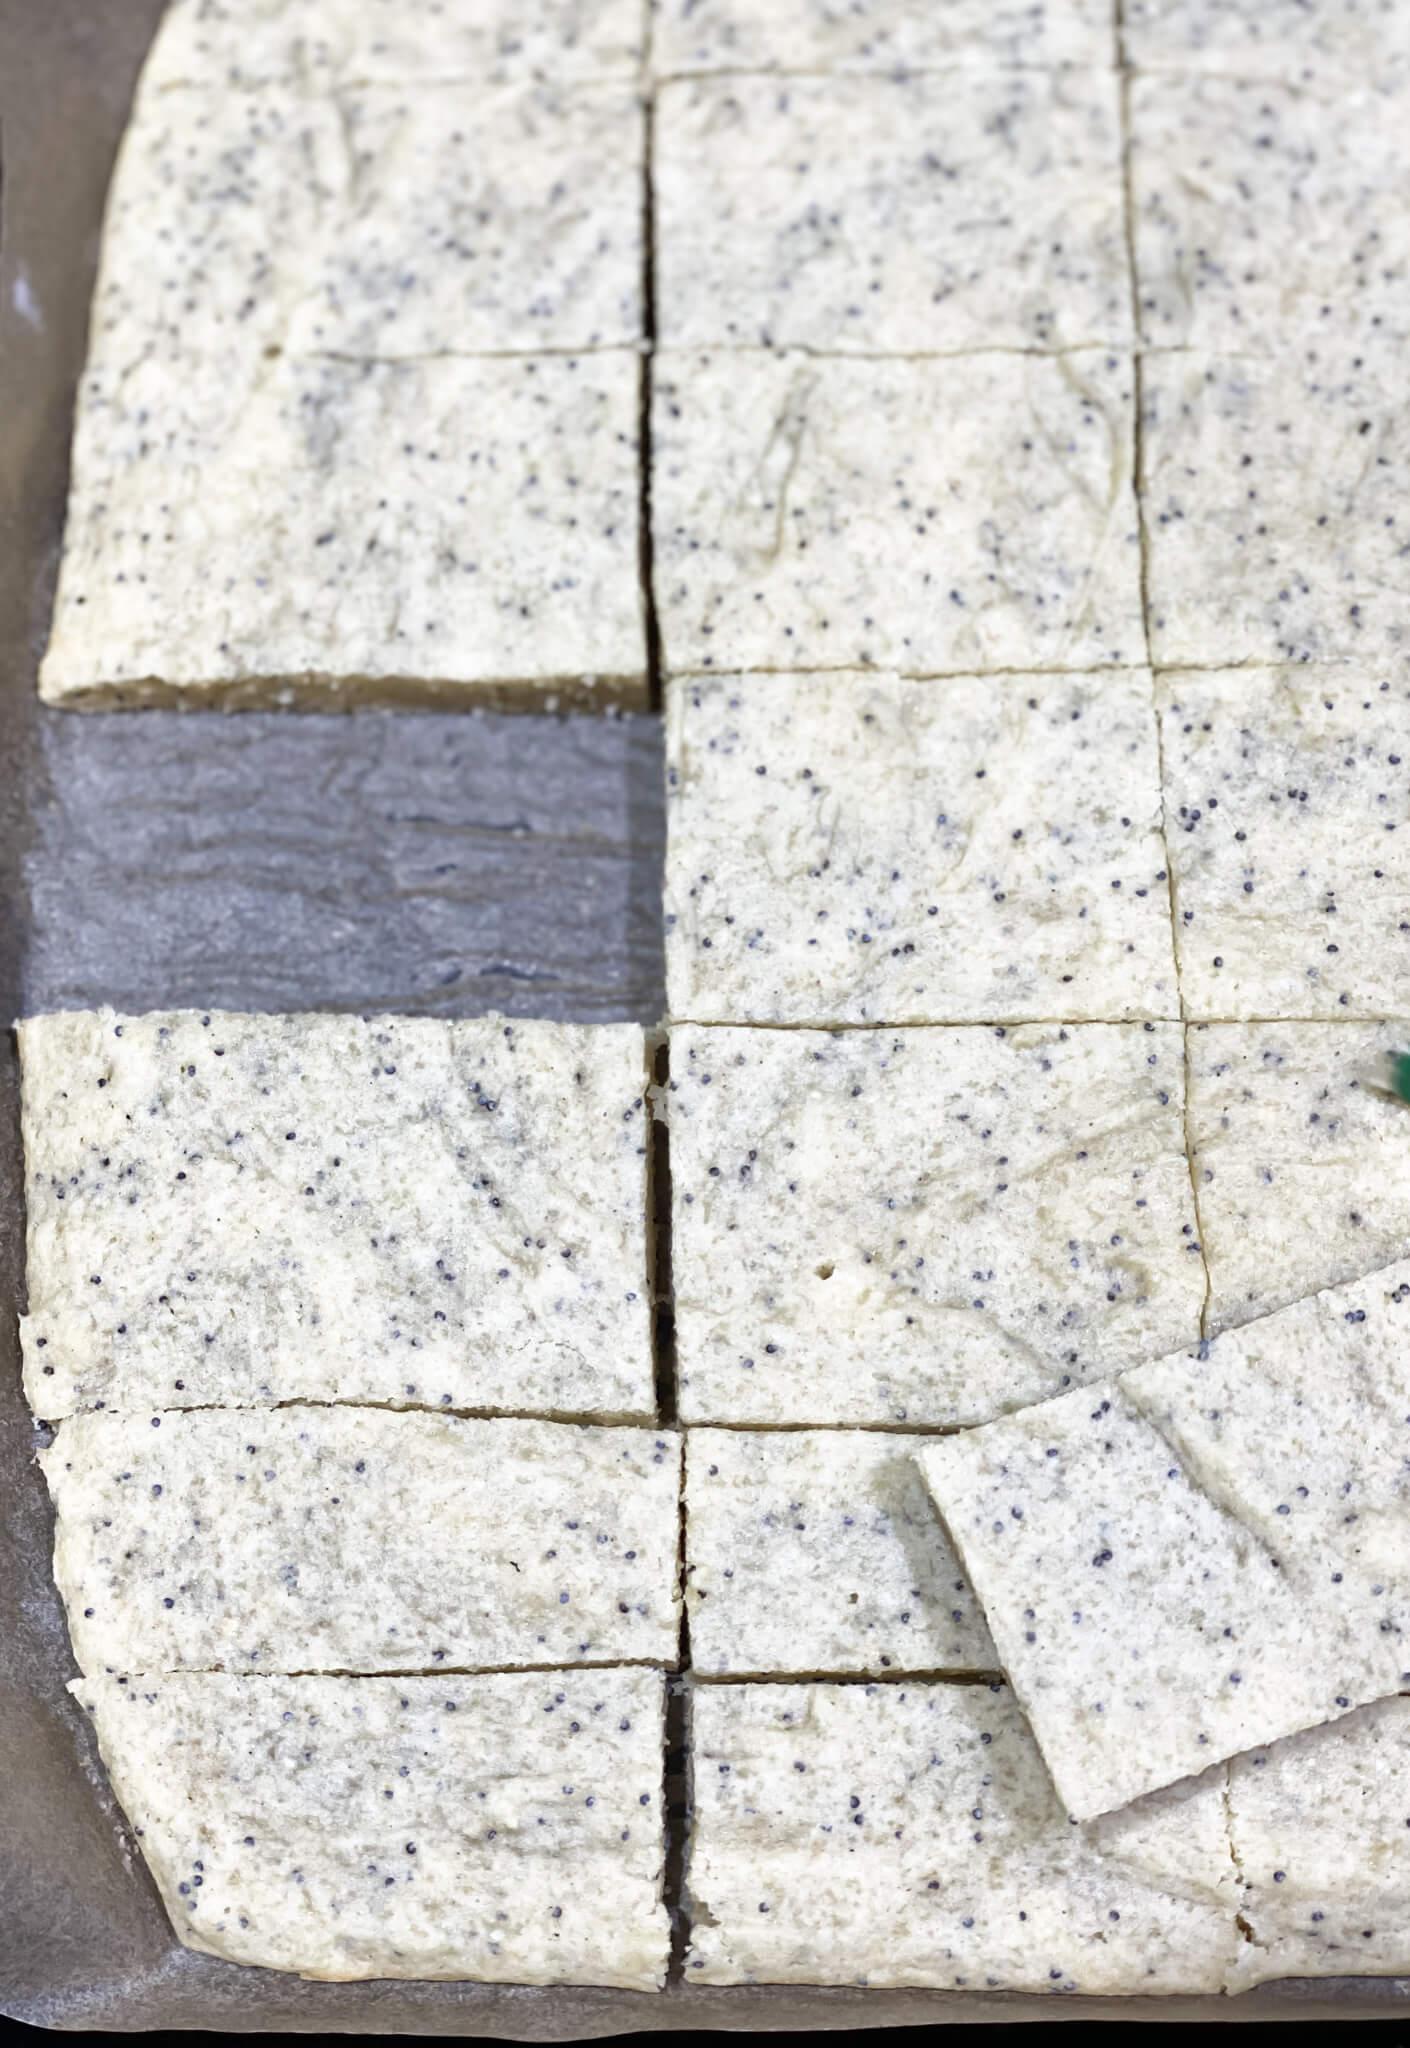 Gluten and Dairy-Free Almond Poppy Seed Sheet Cake Recipe agutsygirl.com #glutenfreerecipe #dairyfreerecipe #glutenfreedairyfree #poppyseed done